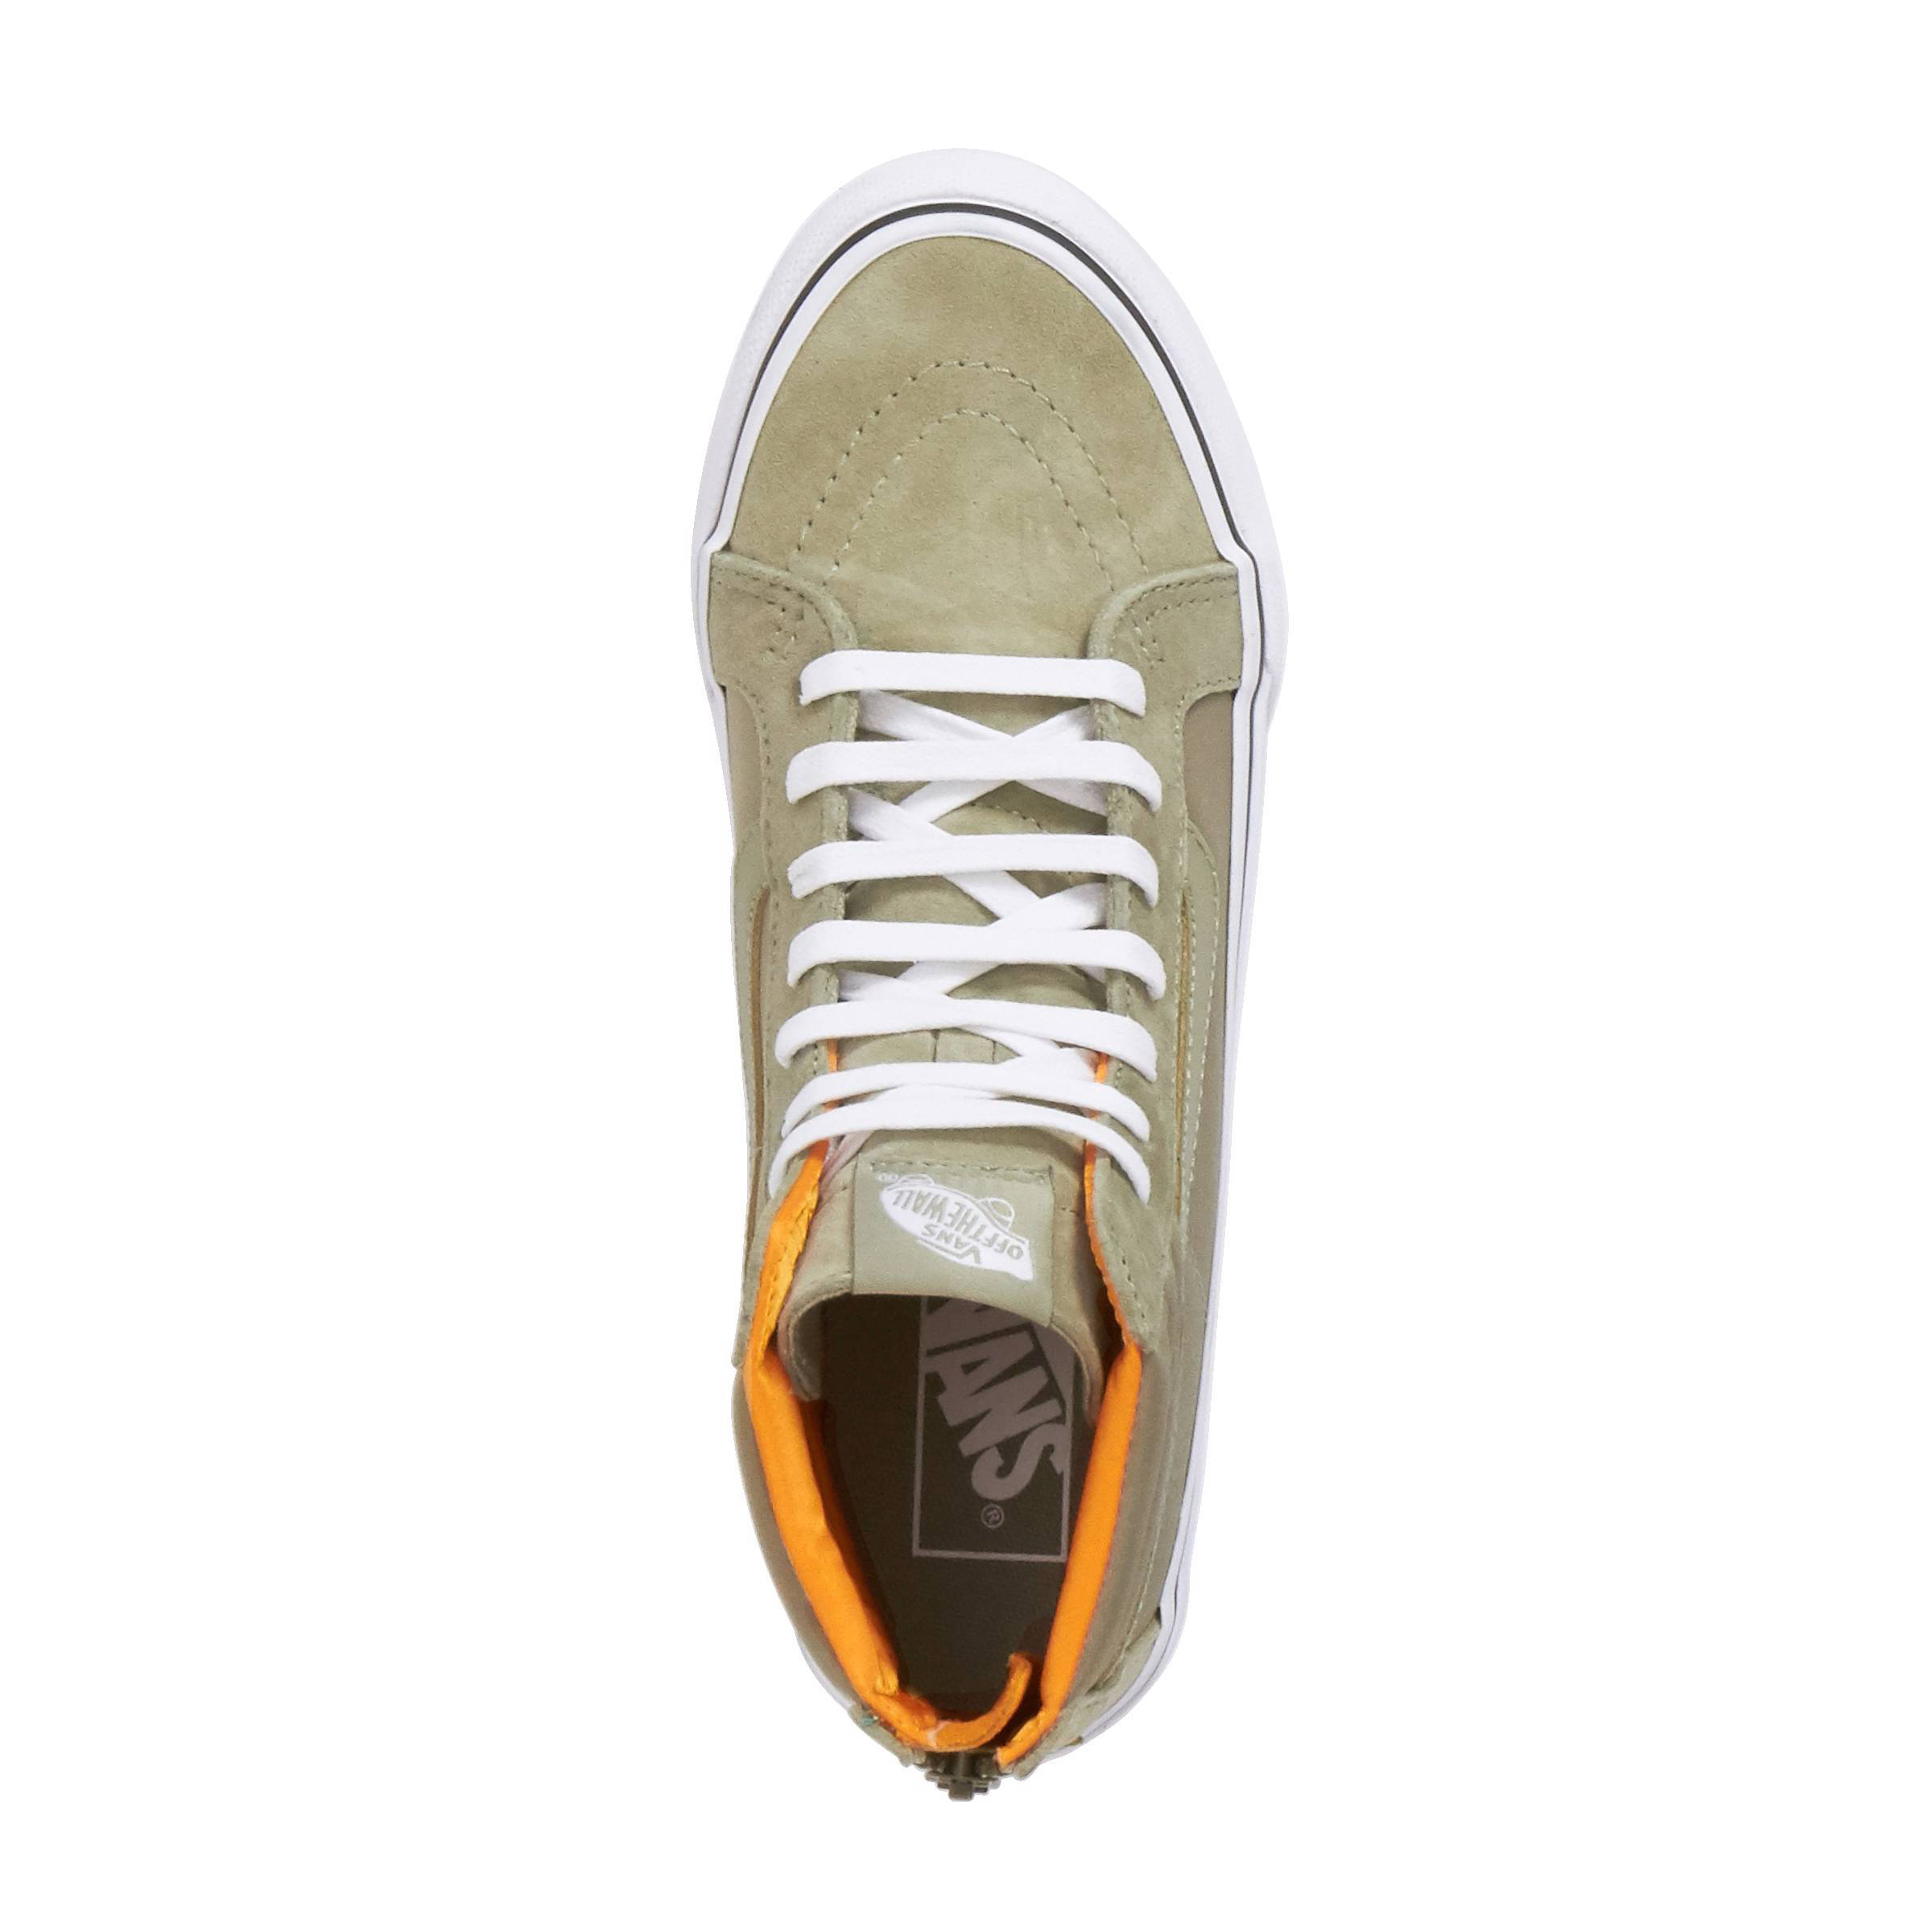 SK8 Hi Slim Zip sneakers